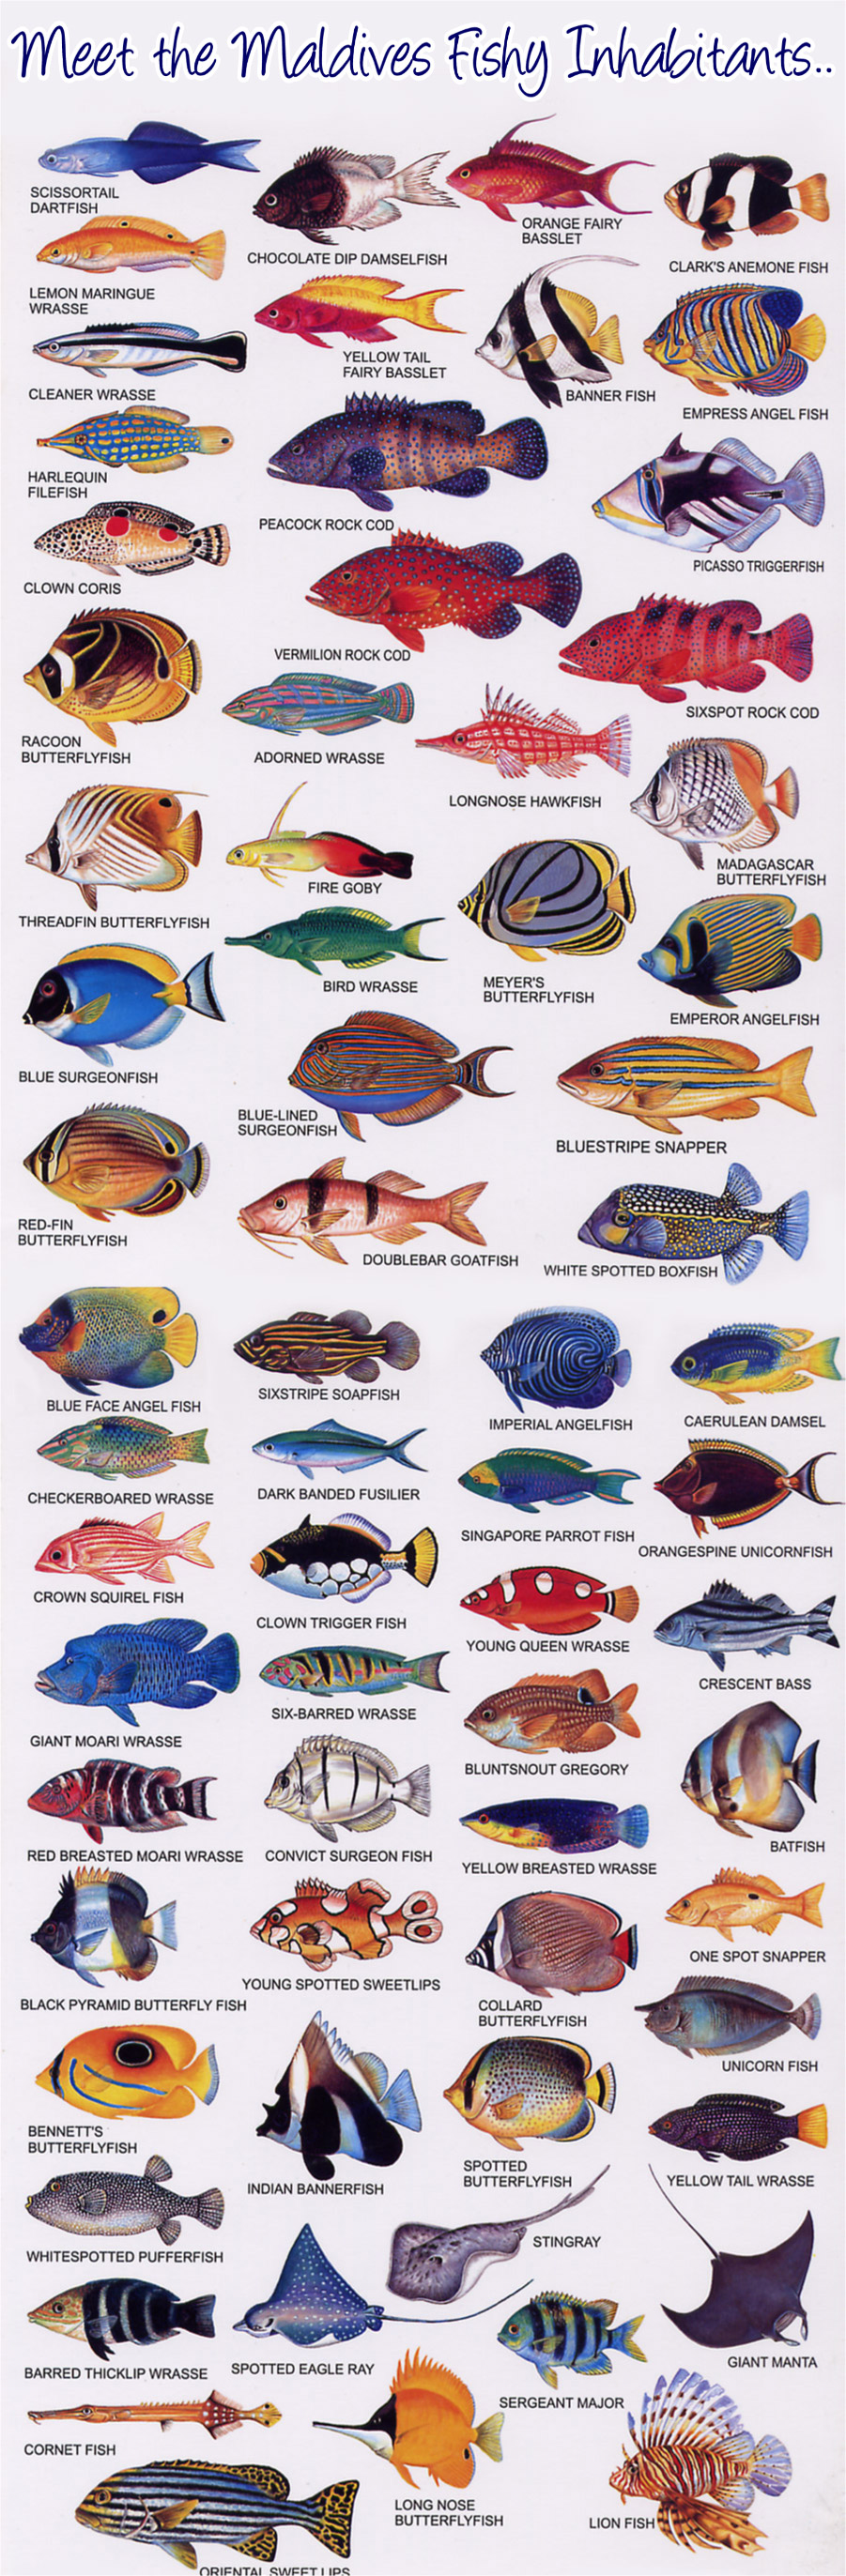 Fish of the Maldives